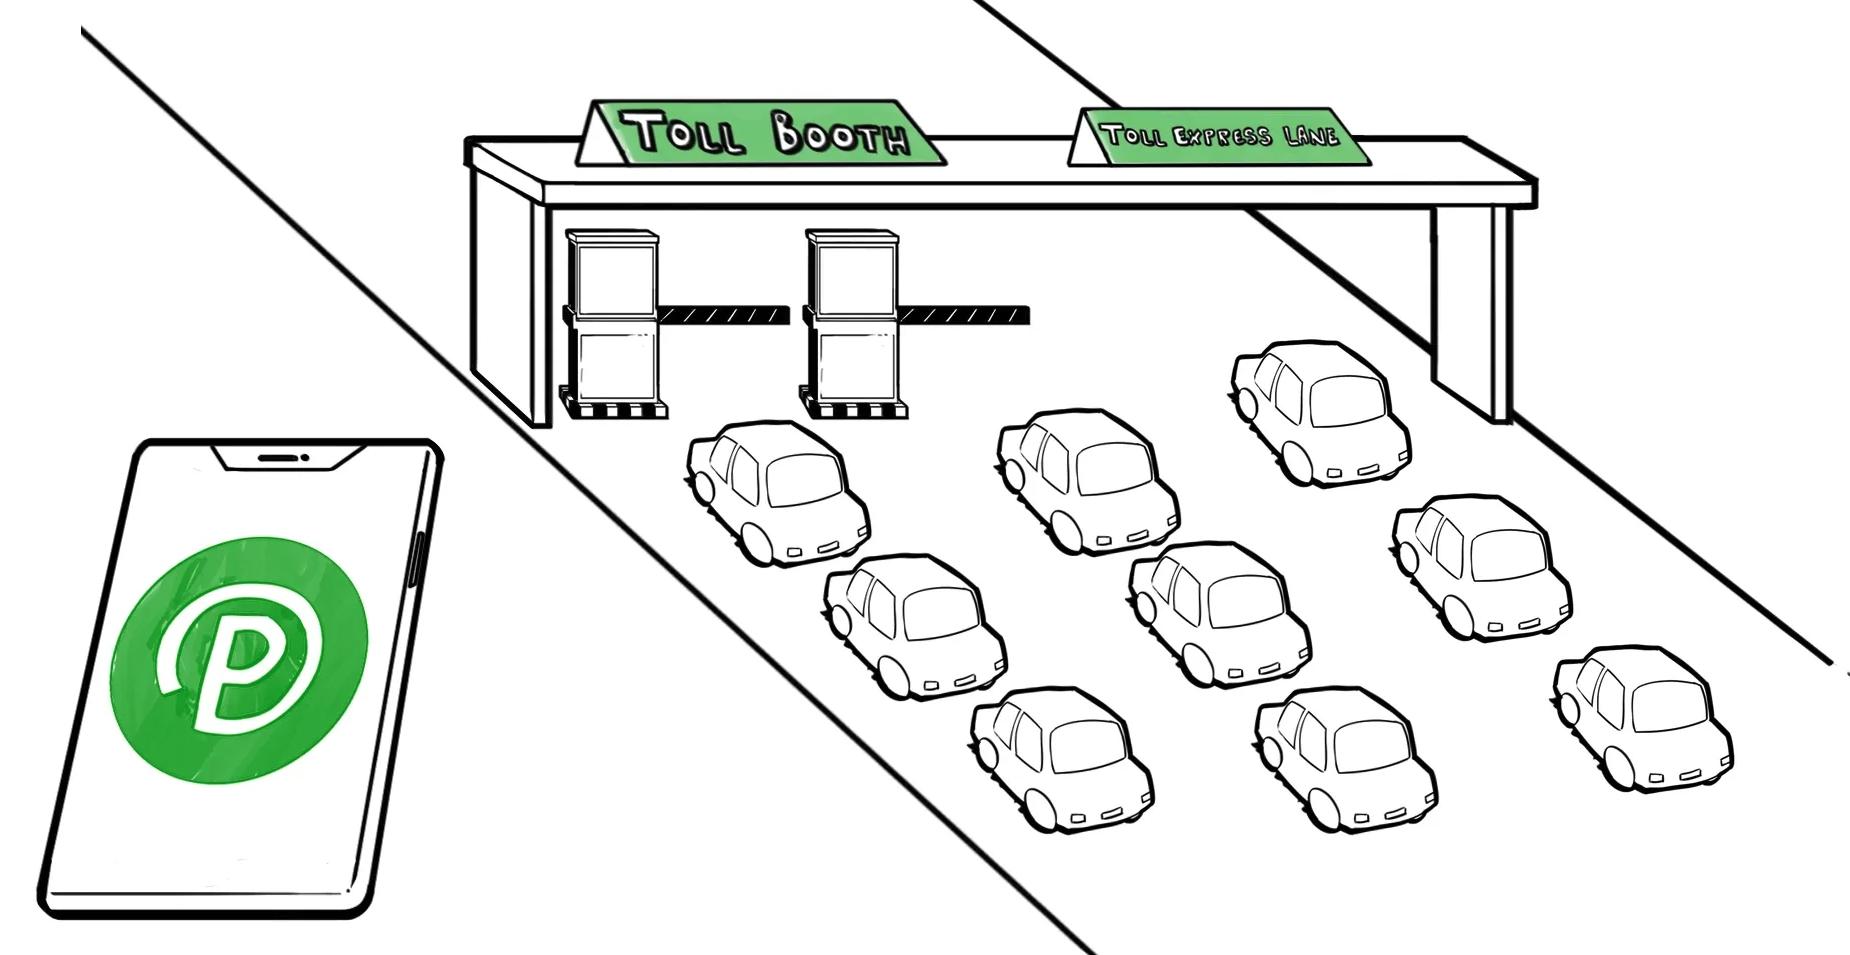 ParkMobile For Tolls